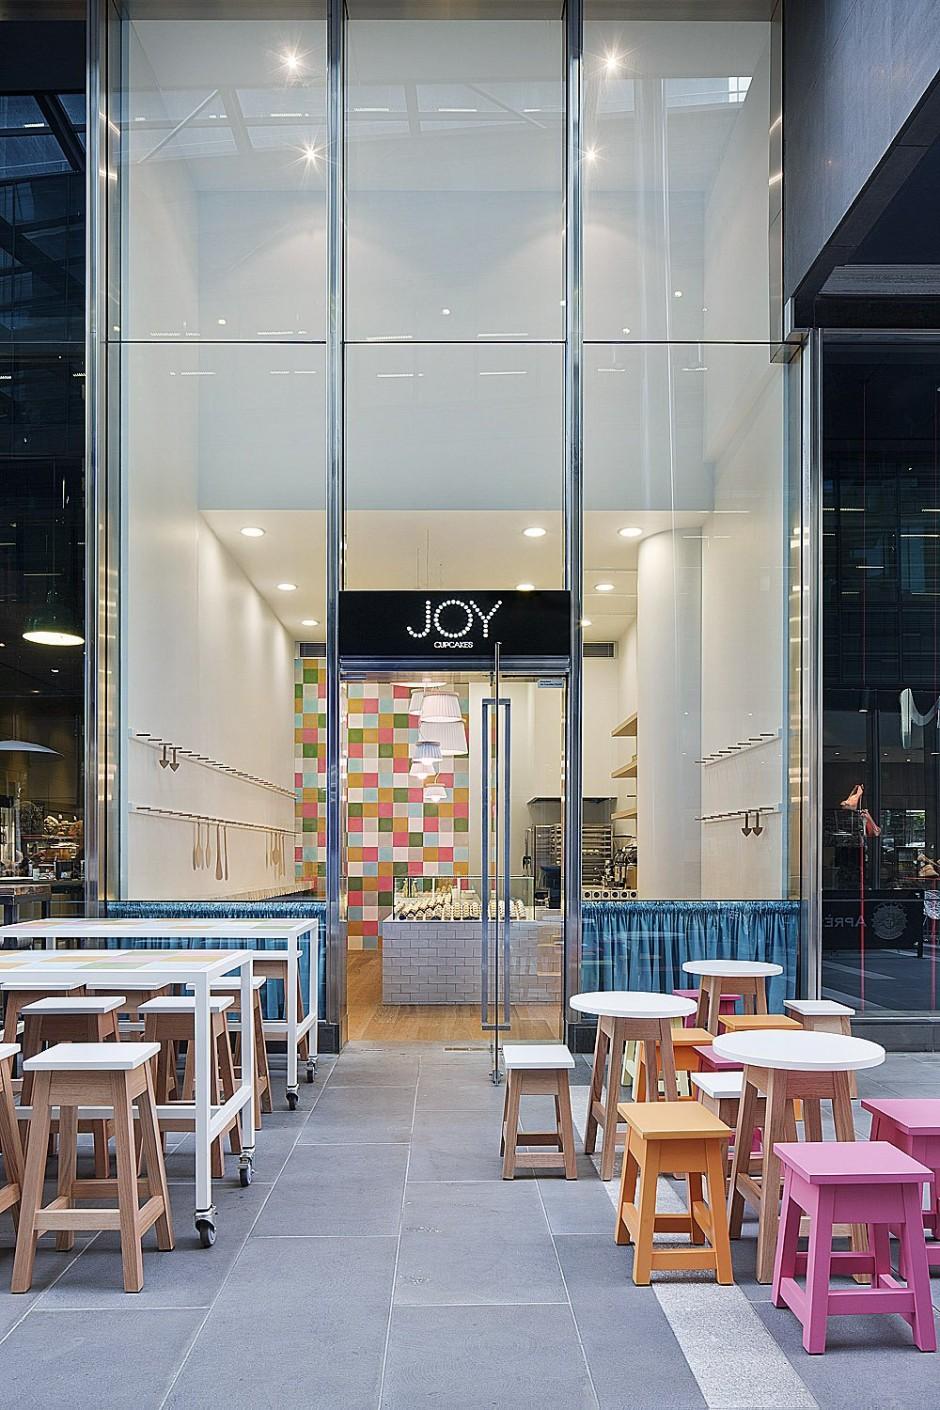 Best Restaurant Interior Design Ideas: Cupcake shop, Melbourne ...